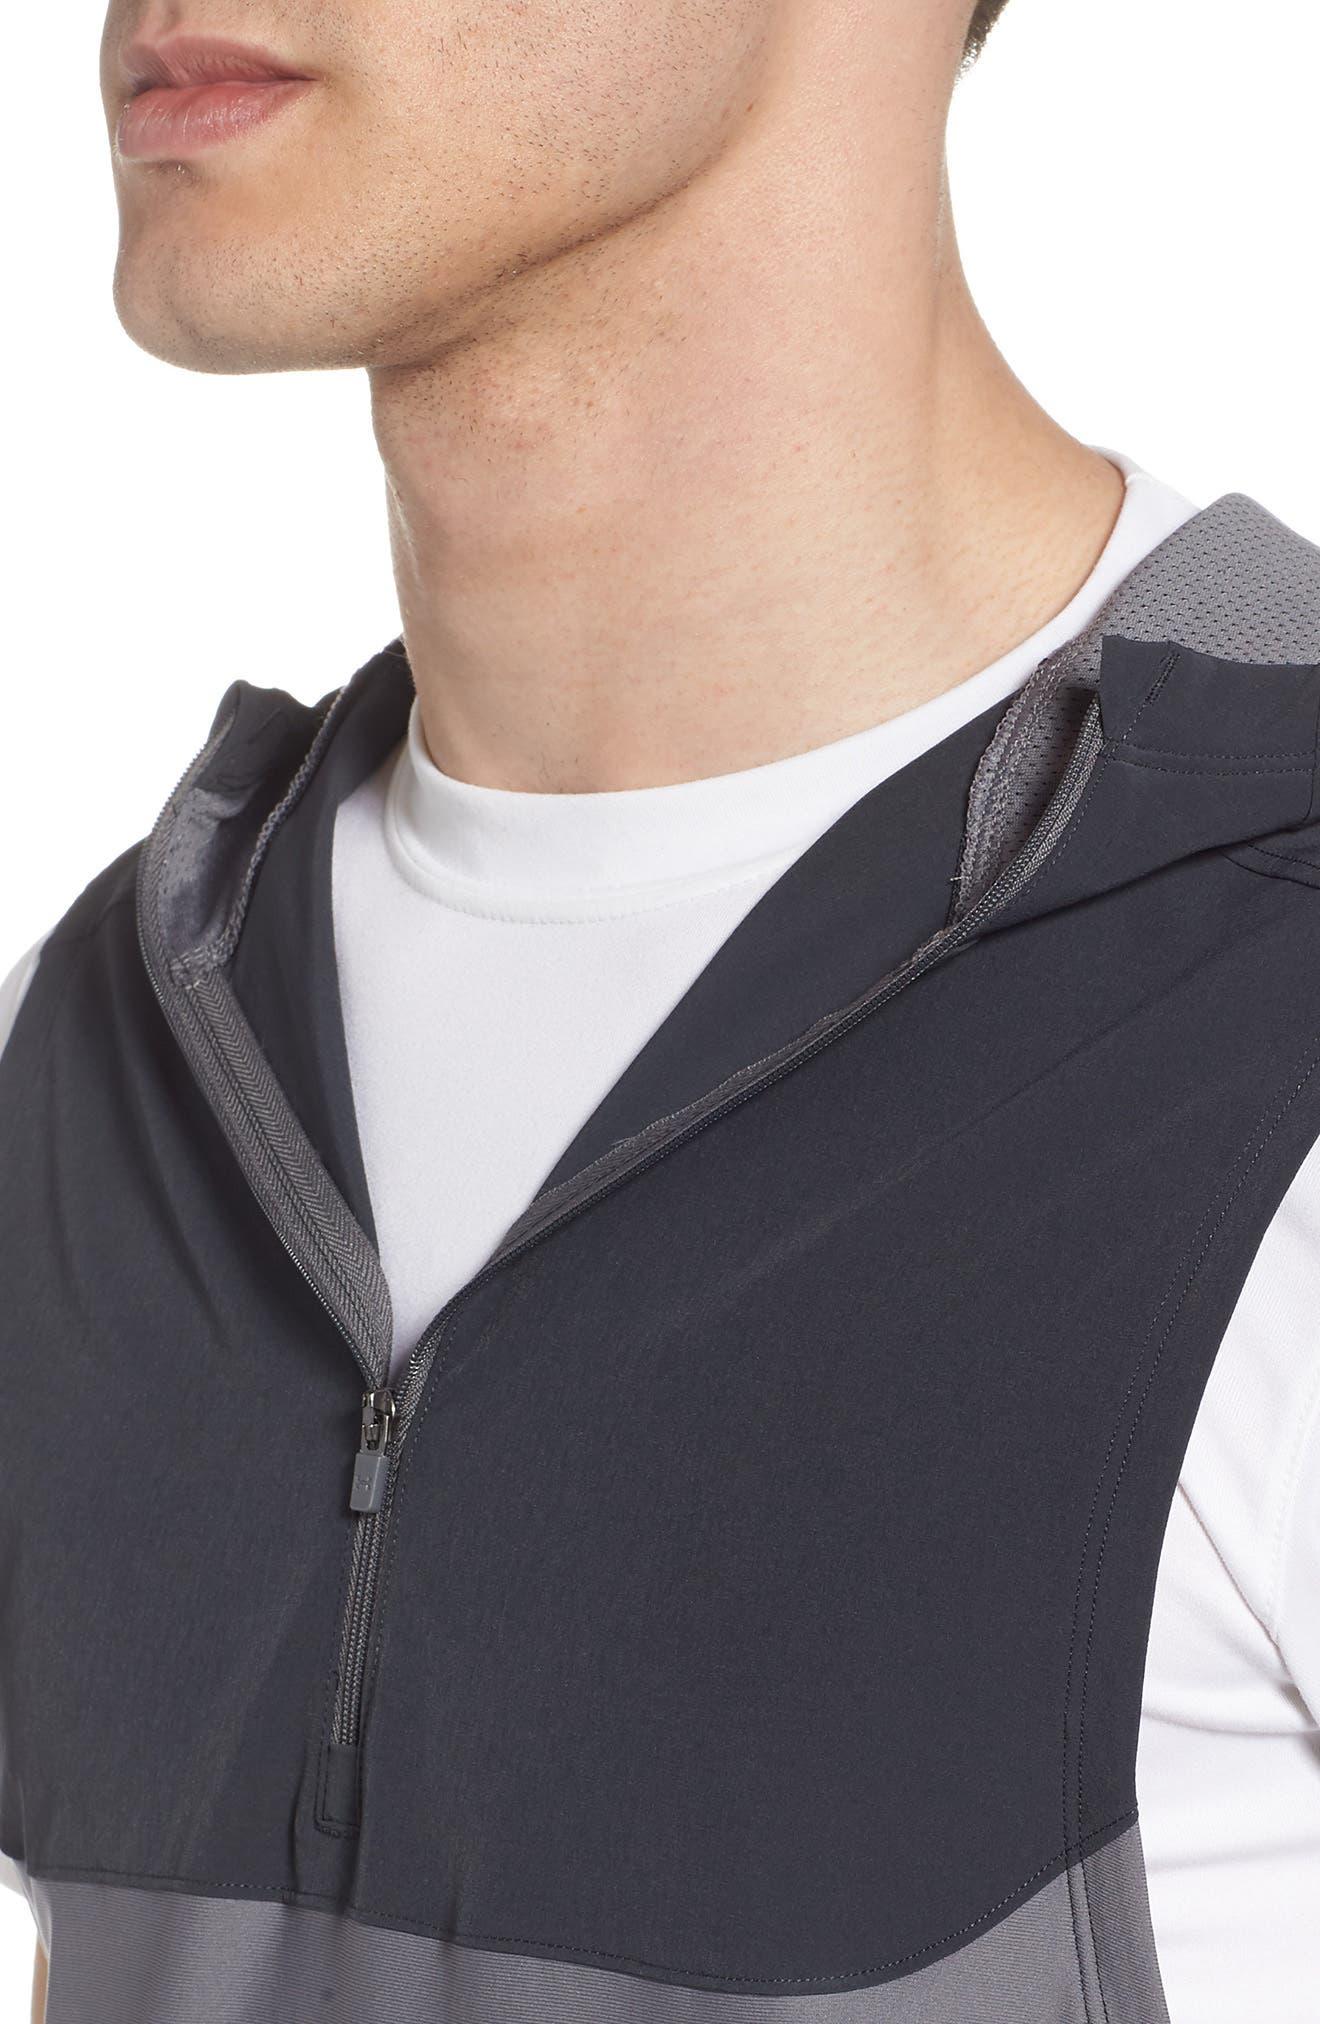 Threadborne Vanish Vest,                             Alternate thumbnail 4, color,                             Anthracite / Graphite/ Iron